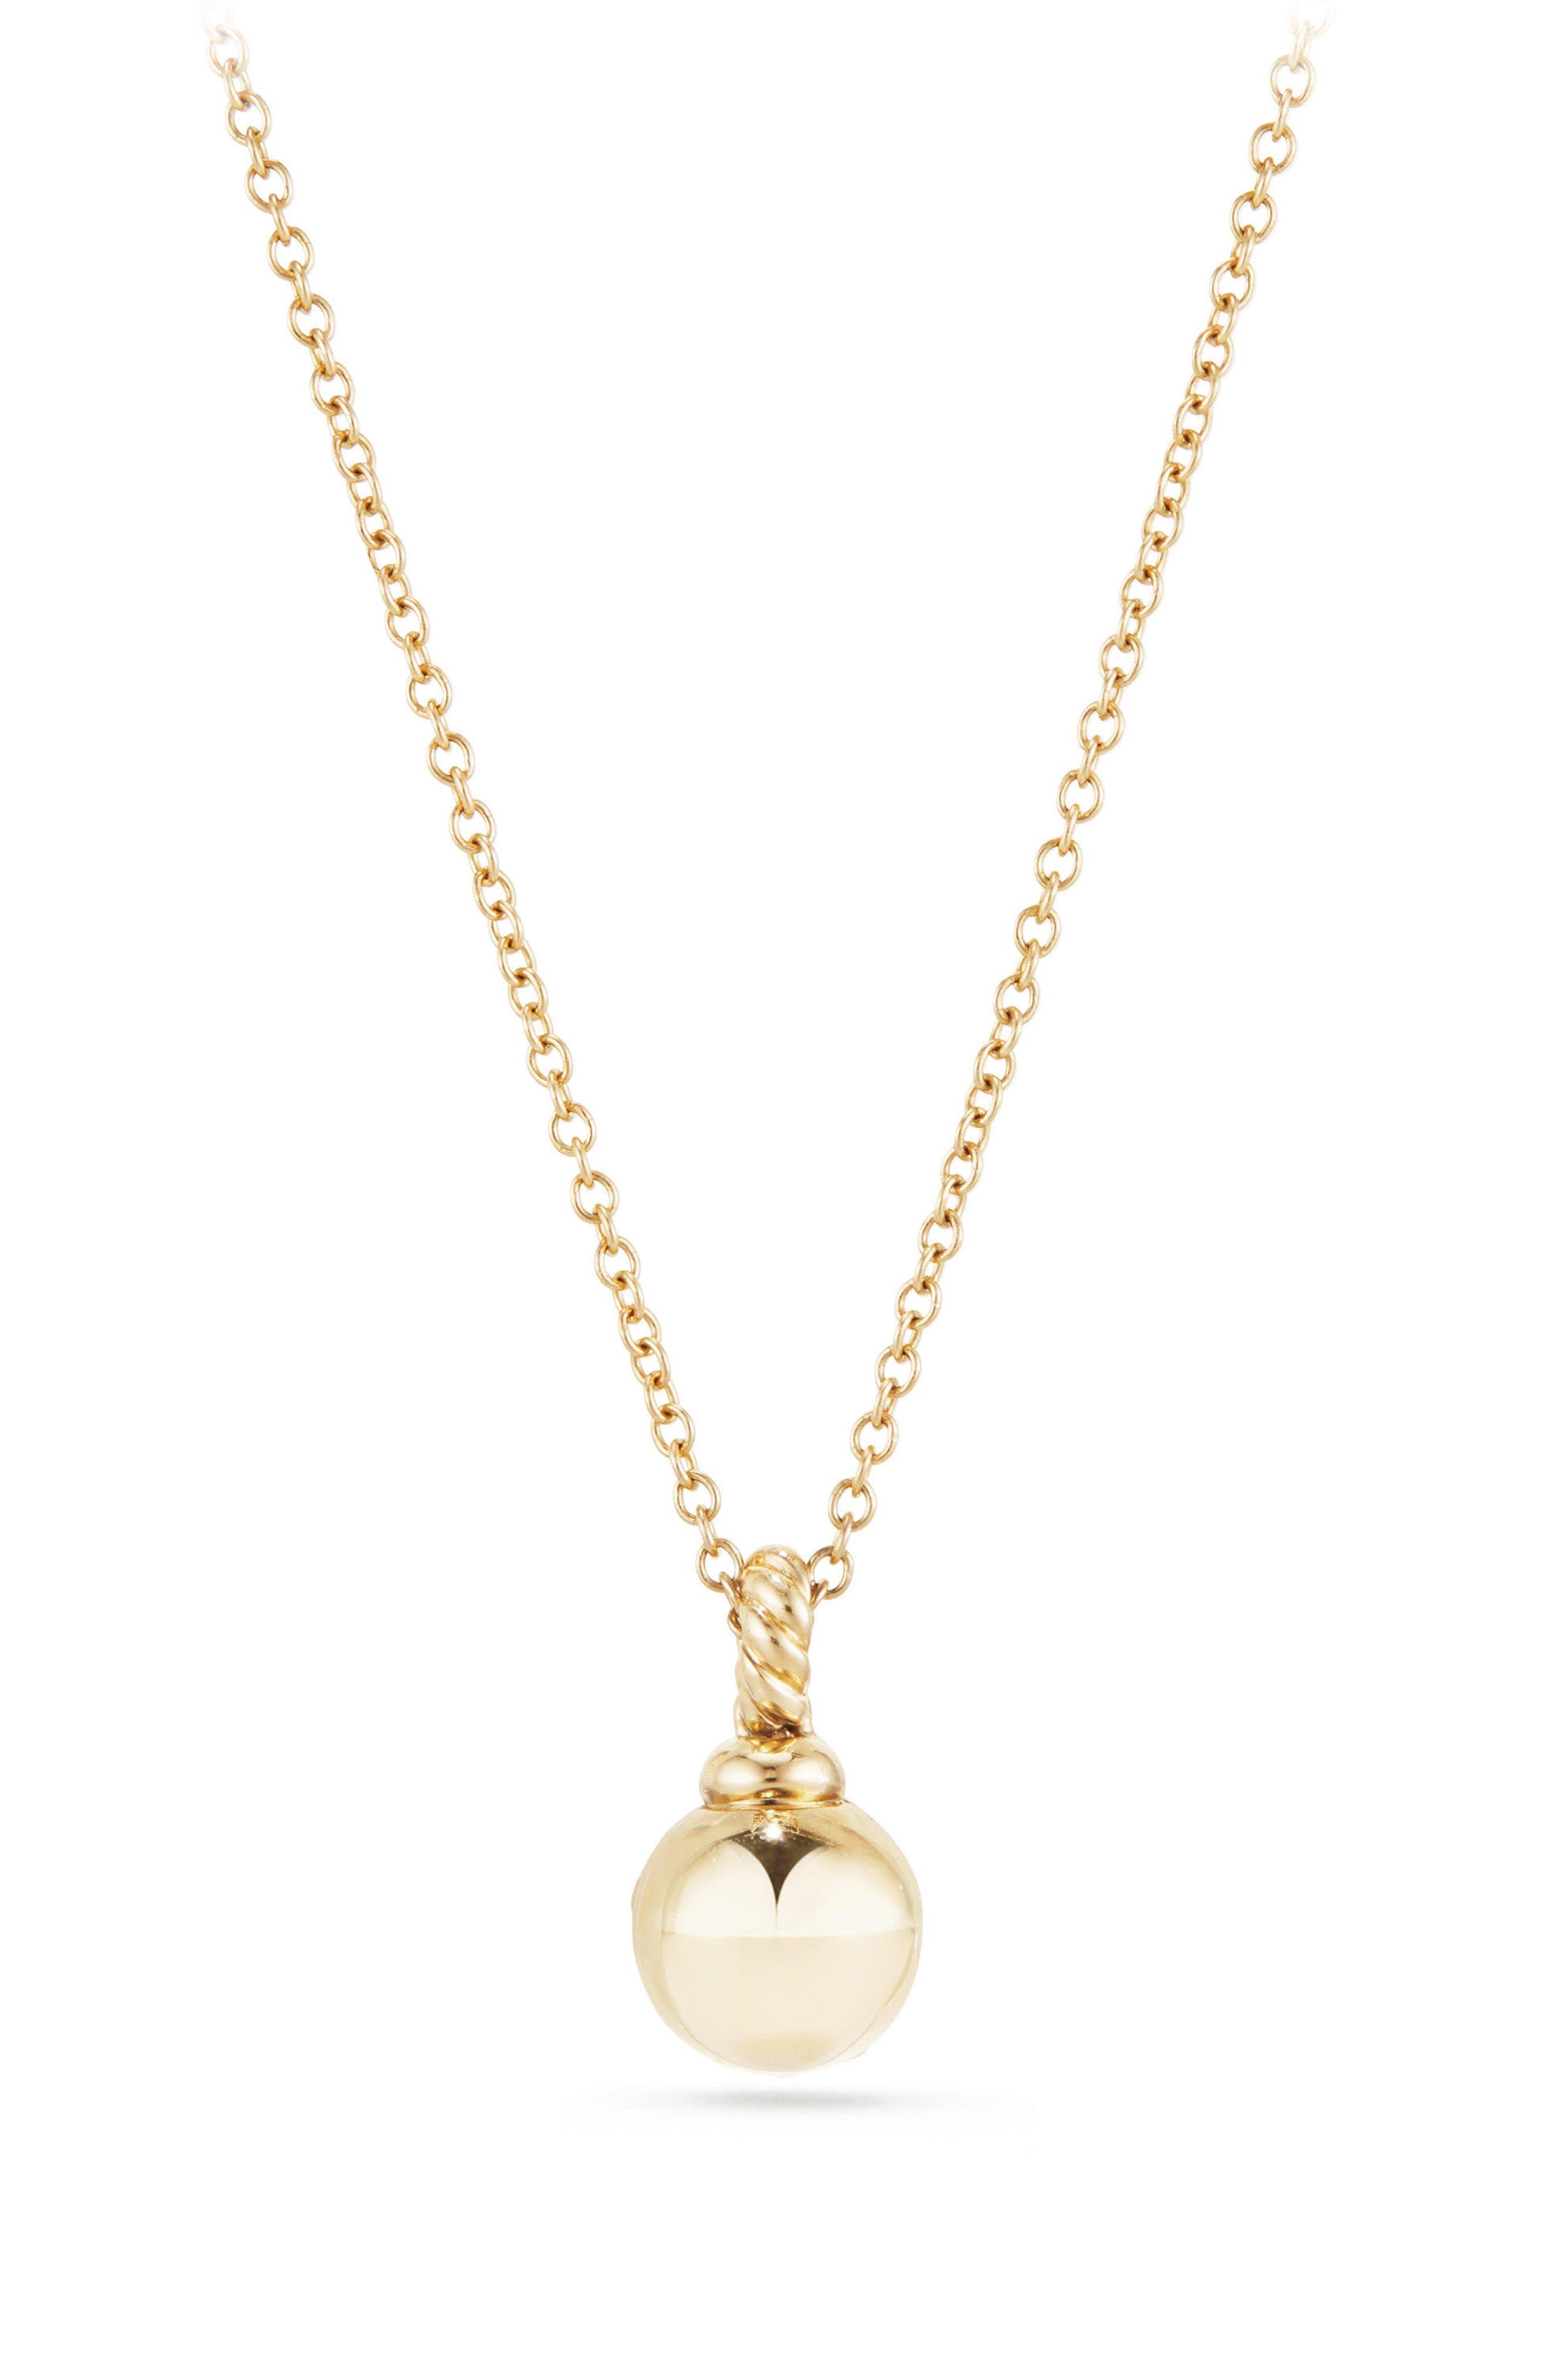 Petite Solari Pavé Necklace with Diamonds in 18K Gold,                             Alternate thumbnail 2, color,                             YELLOW GOLD/ DIAMOND